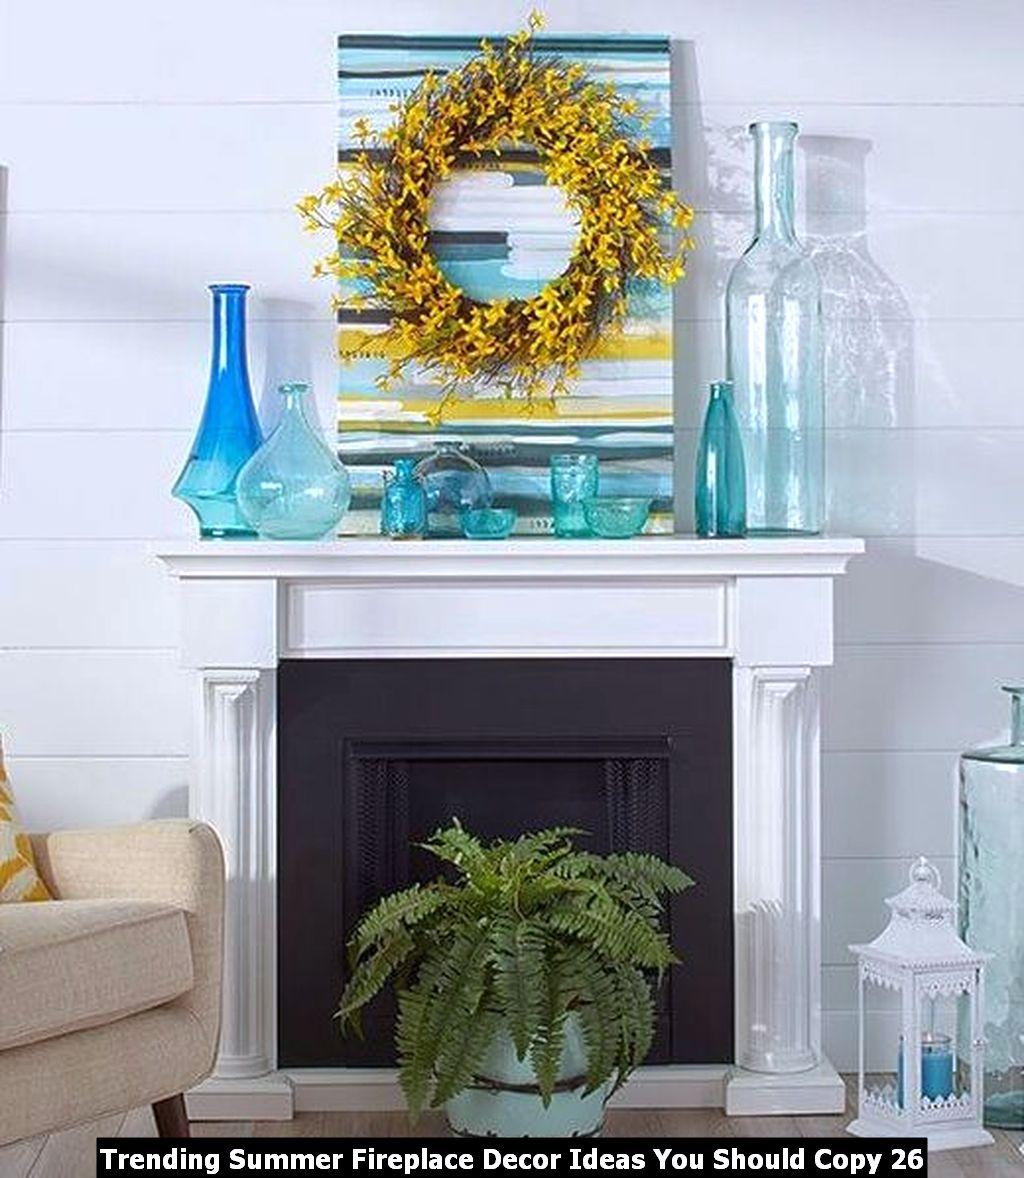 Trending Summer Fireplace Decor Ideas You Should Copy 26